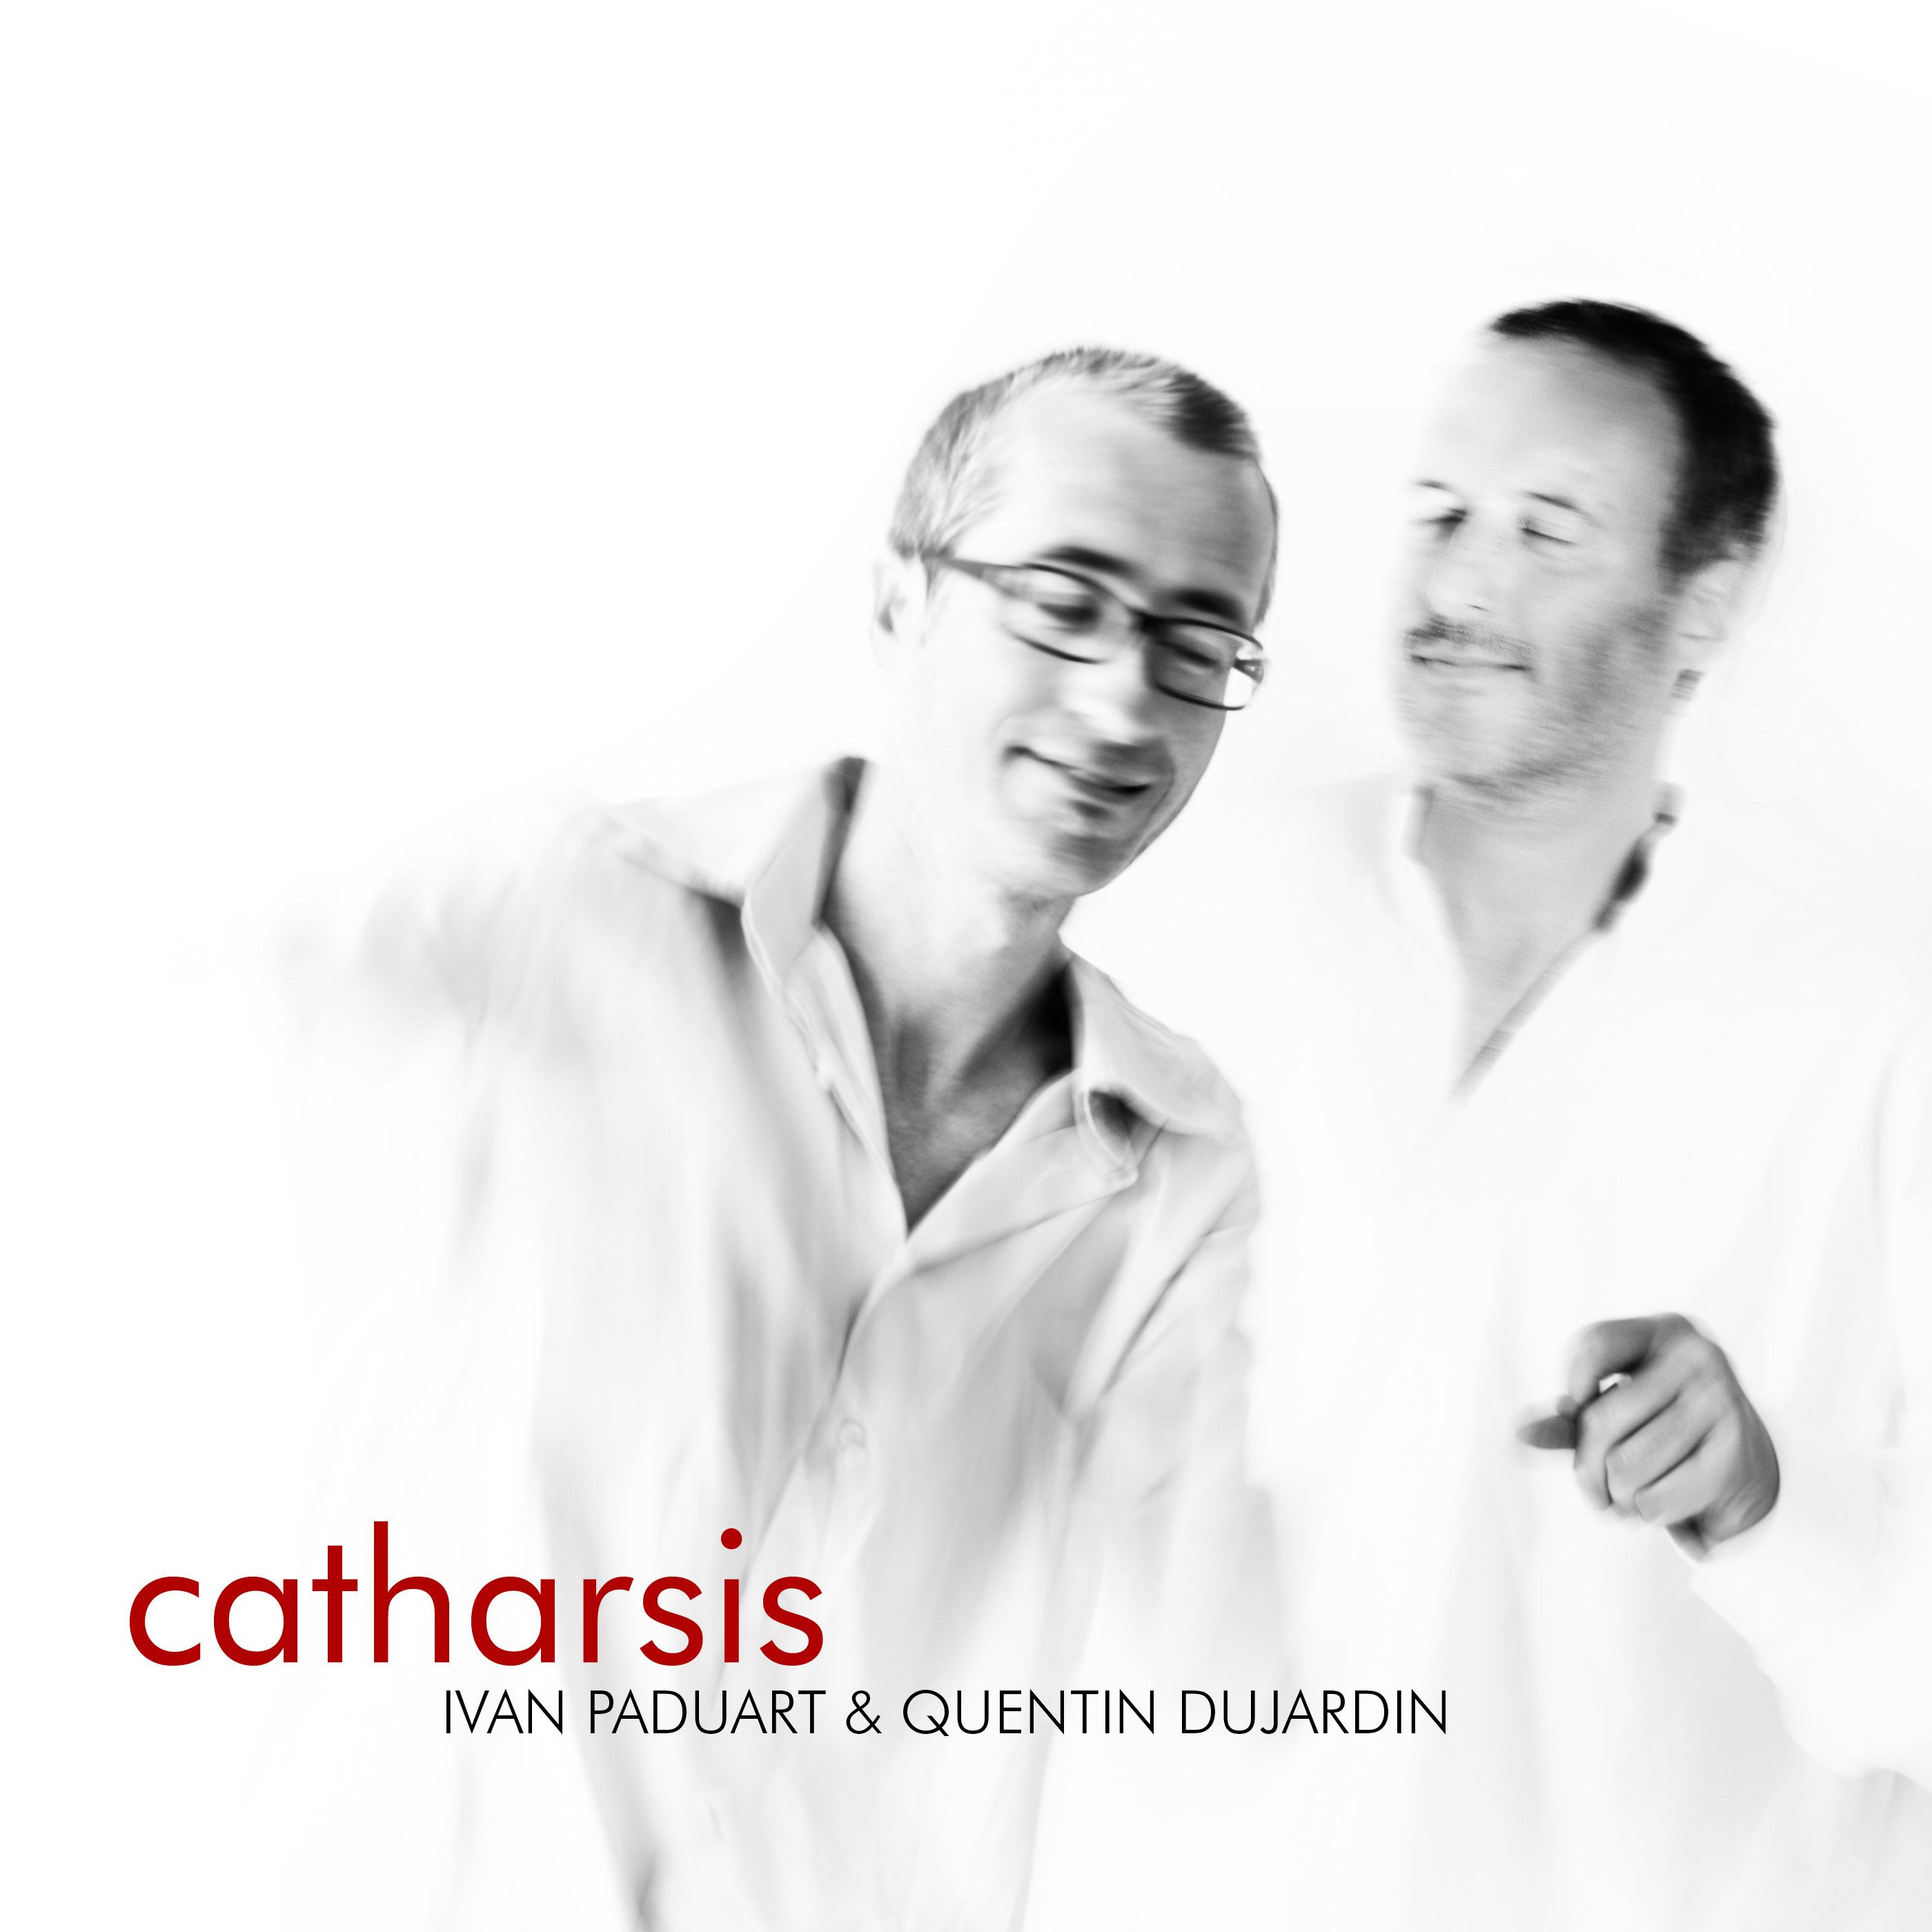 Quentin Dujardin & Ivan Paduart